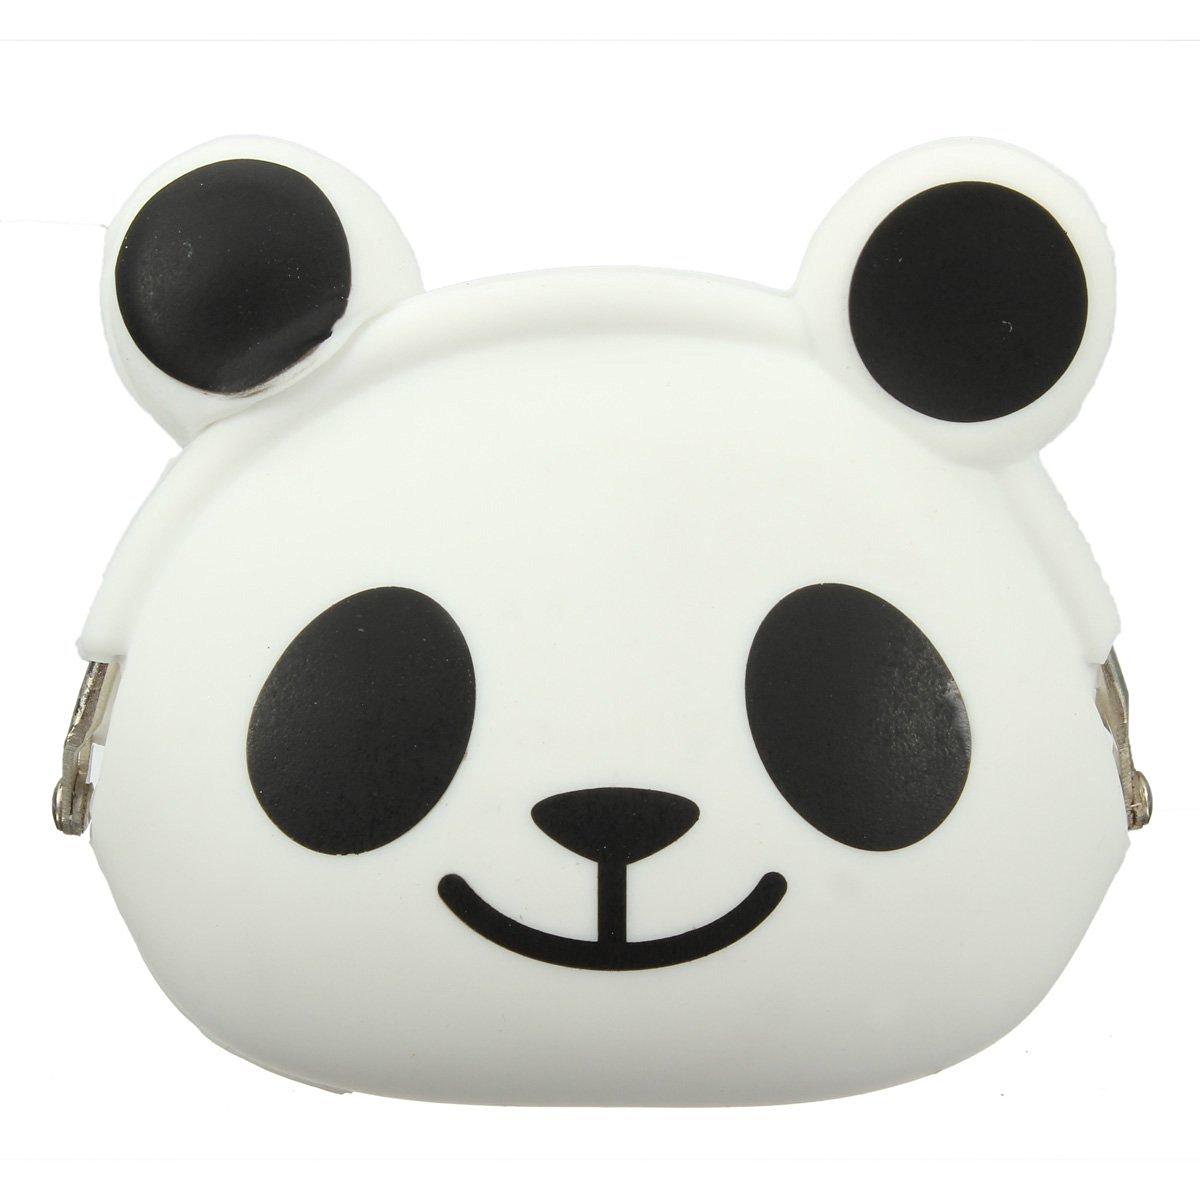 AFBC-Women Girls Wallet Kawaii Cute Cartoon Animal Silicone Jelly Coin Bag Purse Kids Gift Panda